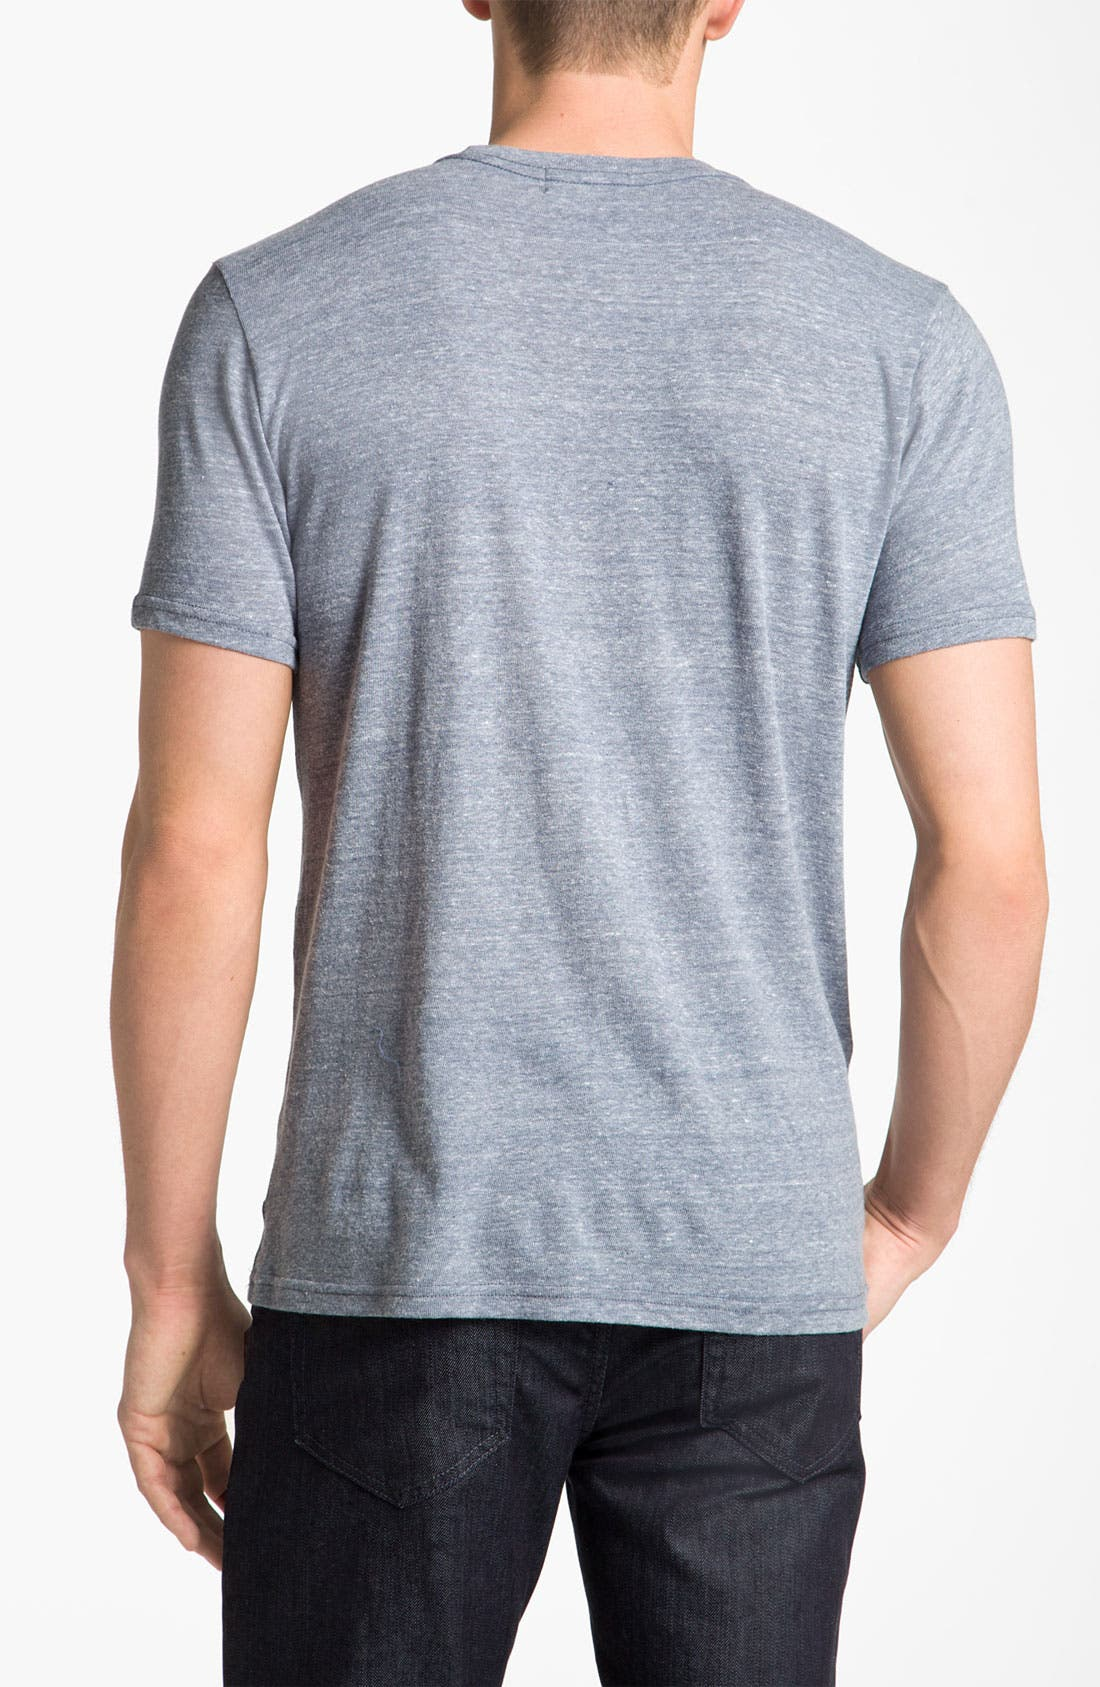 Alternate Image 2  - Junk Food NFL Shield Graphic Crewneck T-Shirt